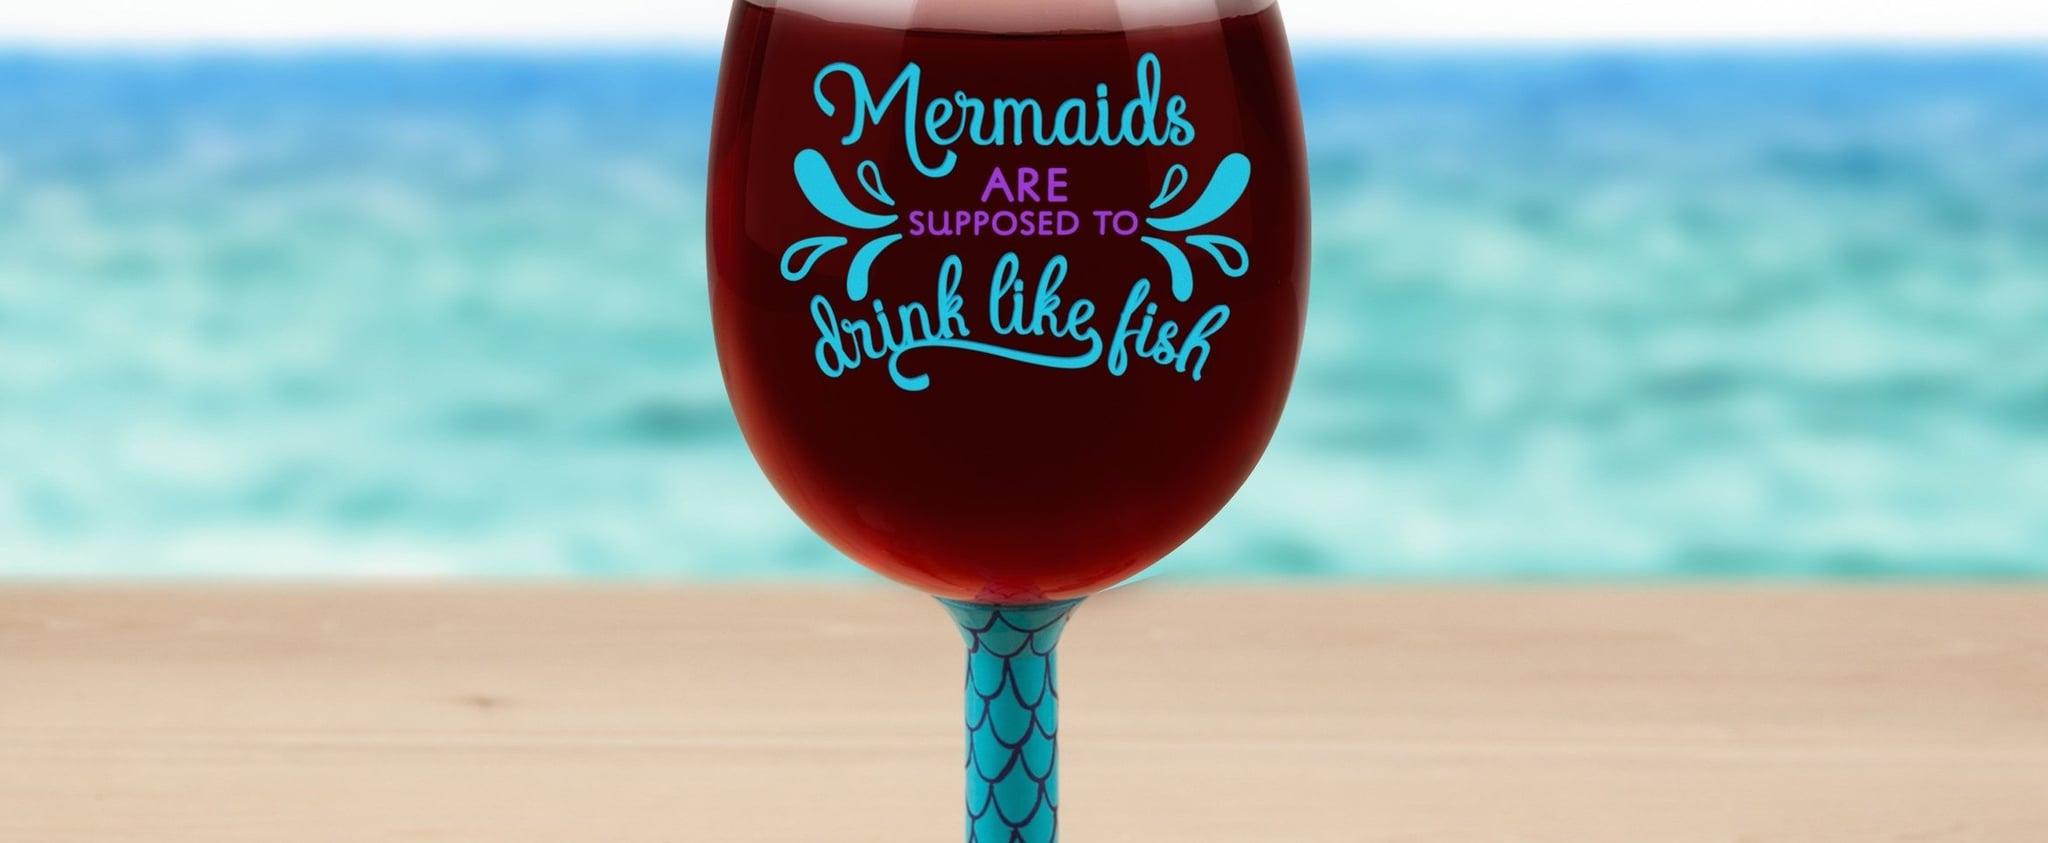 Giant Mermaid Wine Glass